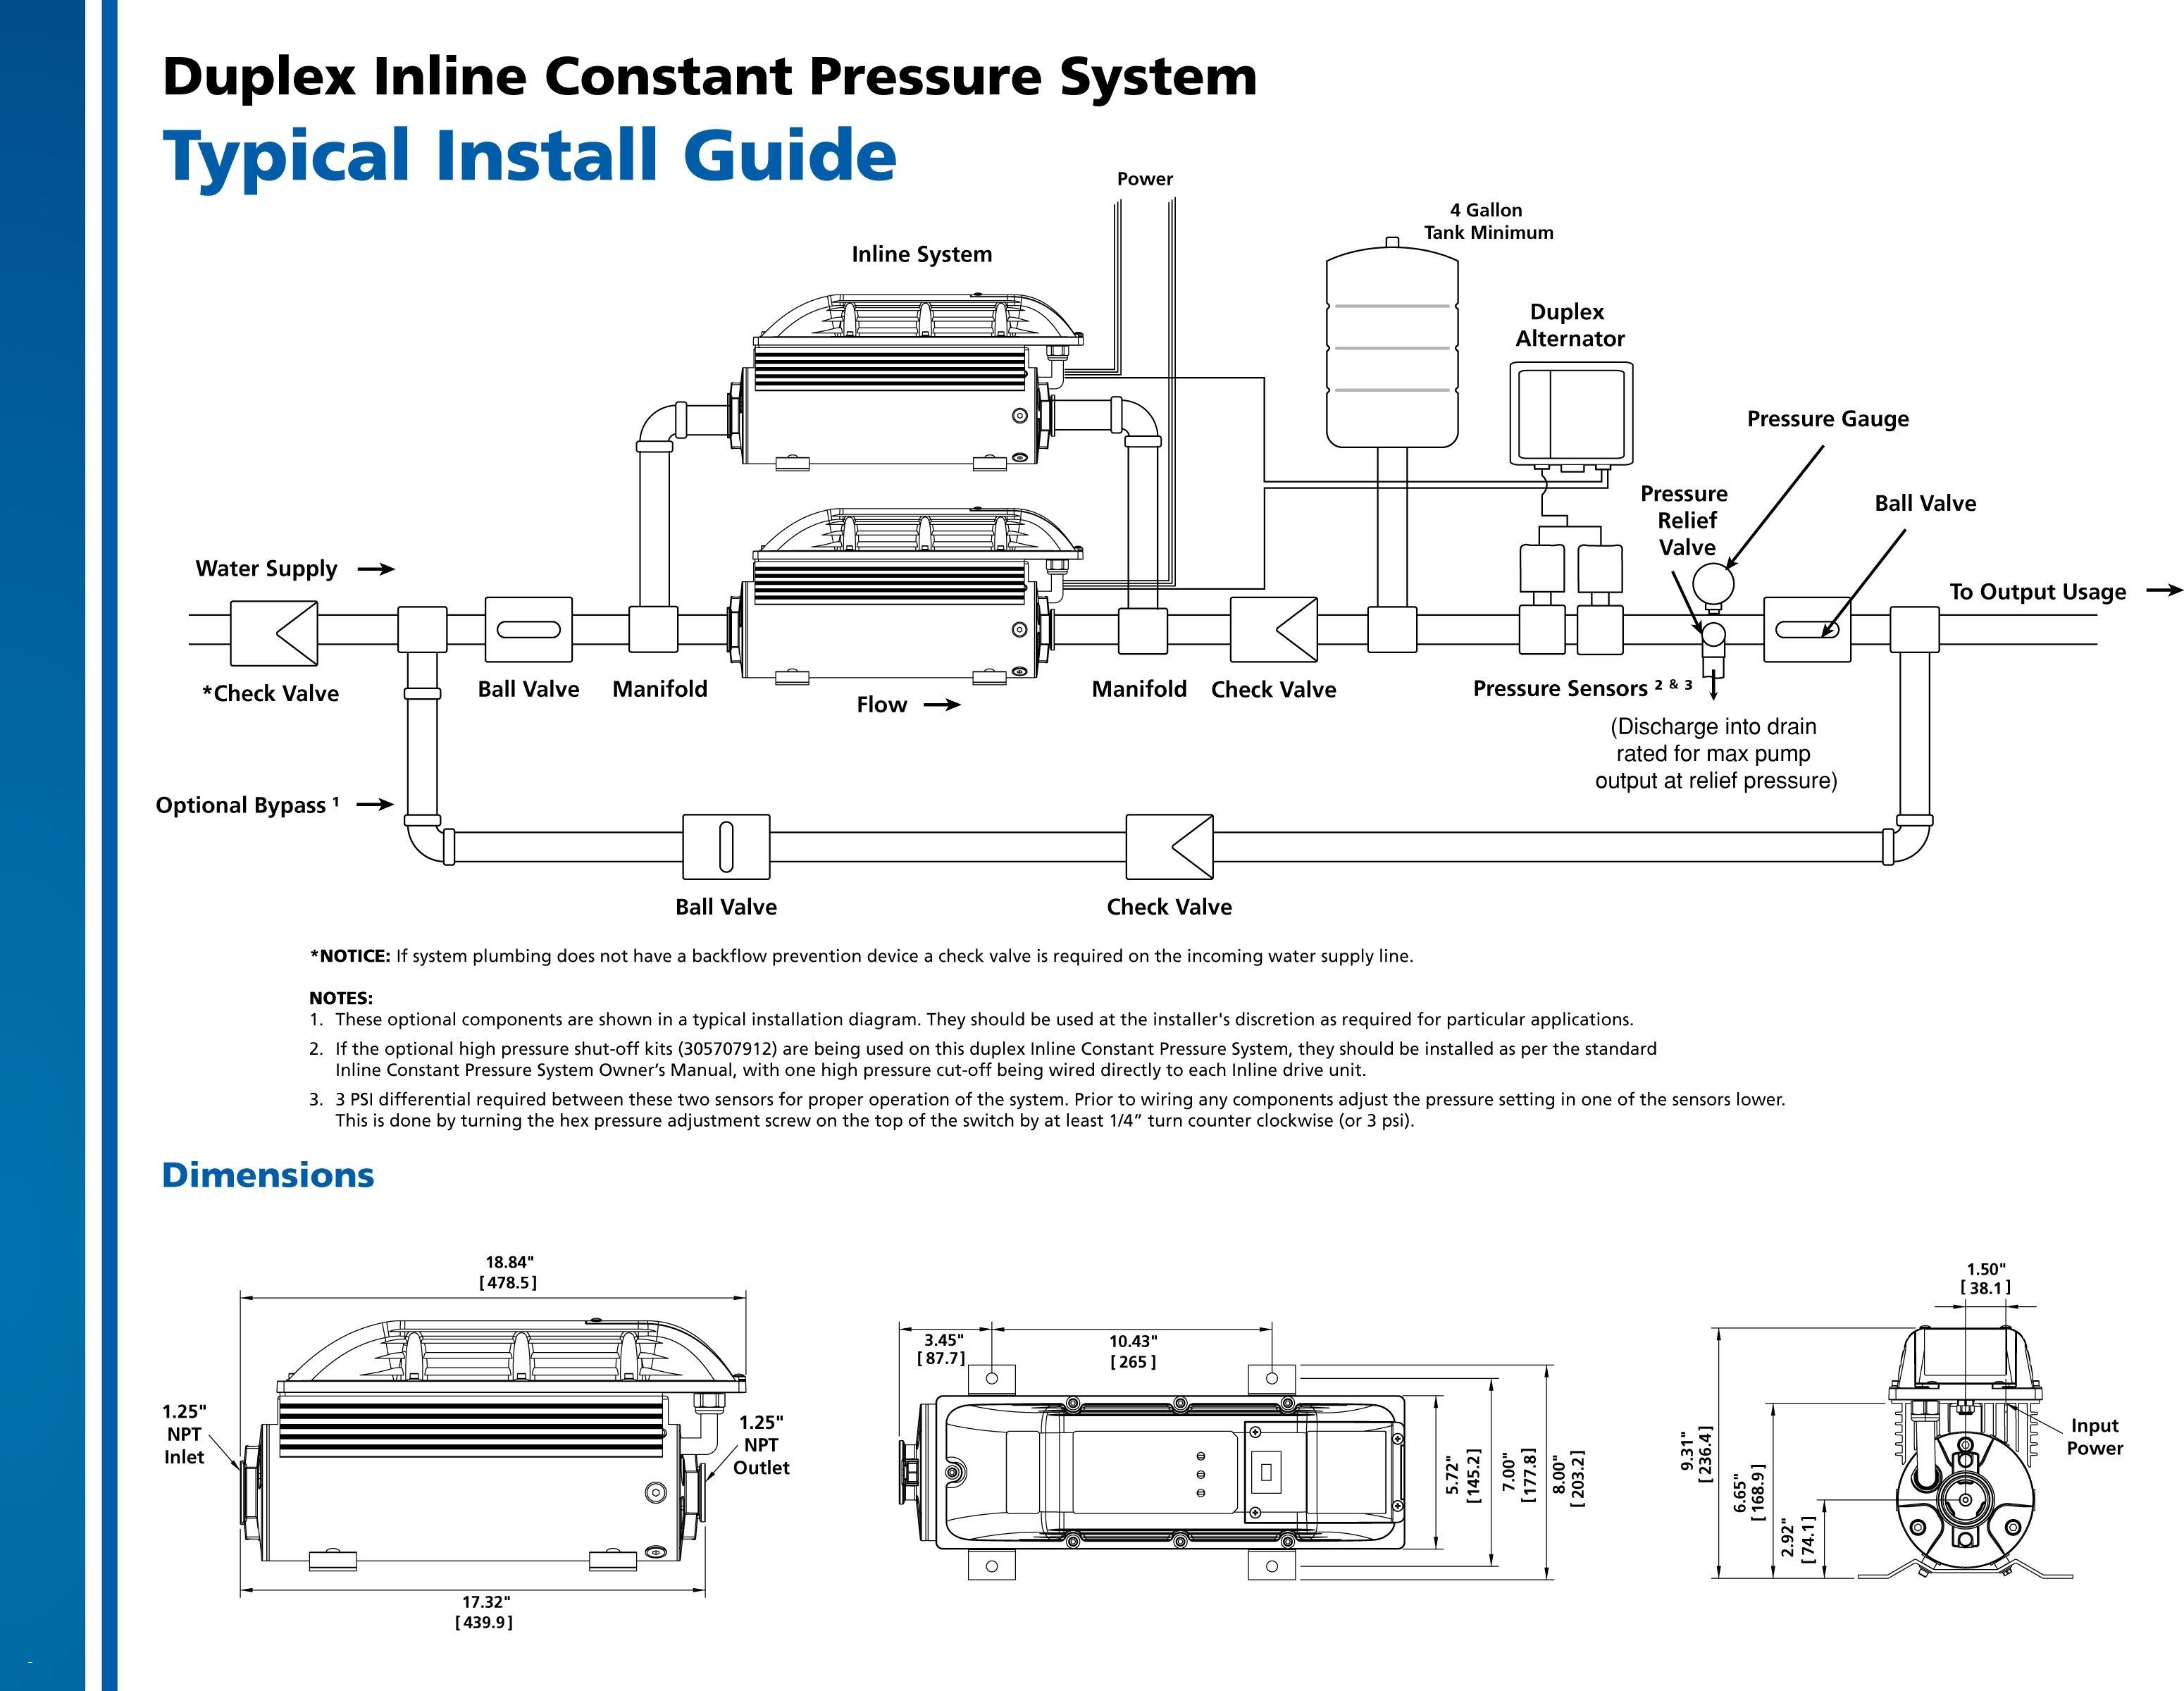 jet pump pressure switch wiring diagram Collection-Wiring Diagram for Water Pump Pressure Switch Inspirationa Wiring Diagram for Jet Pump Valid Well Pump 17-e